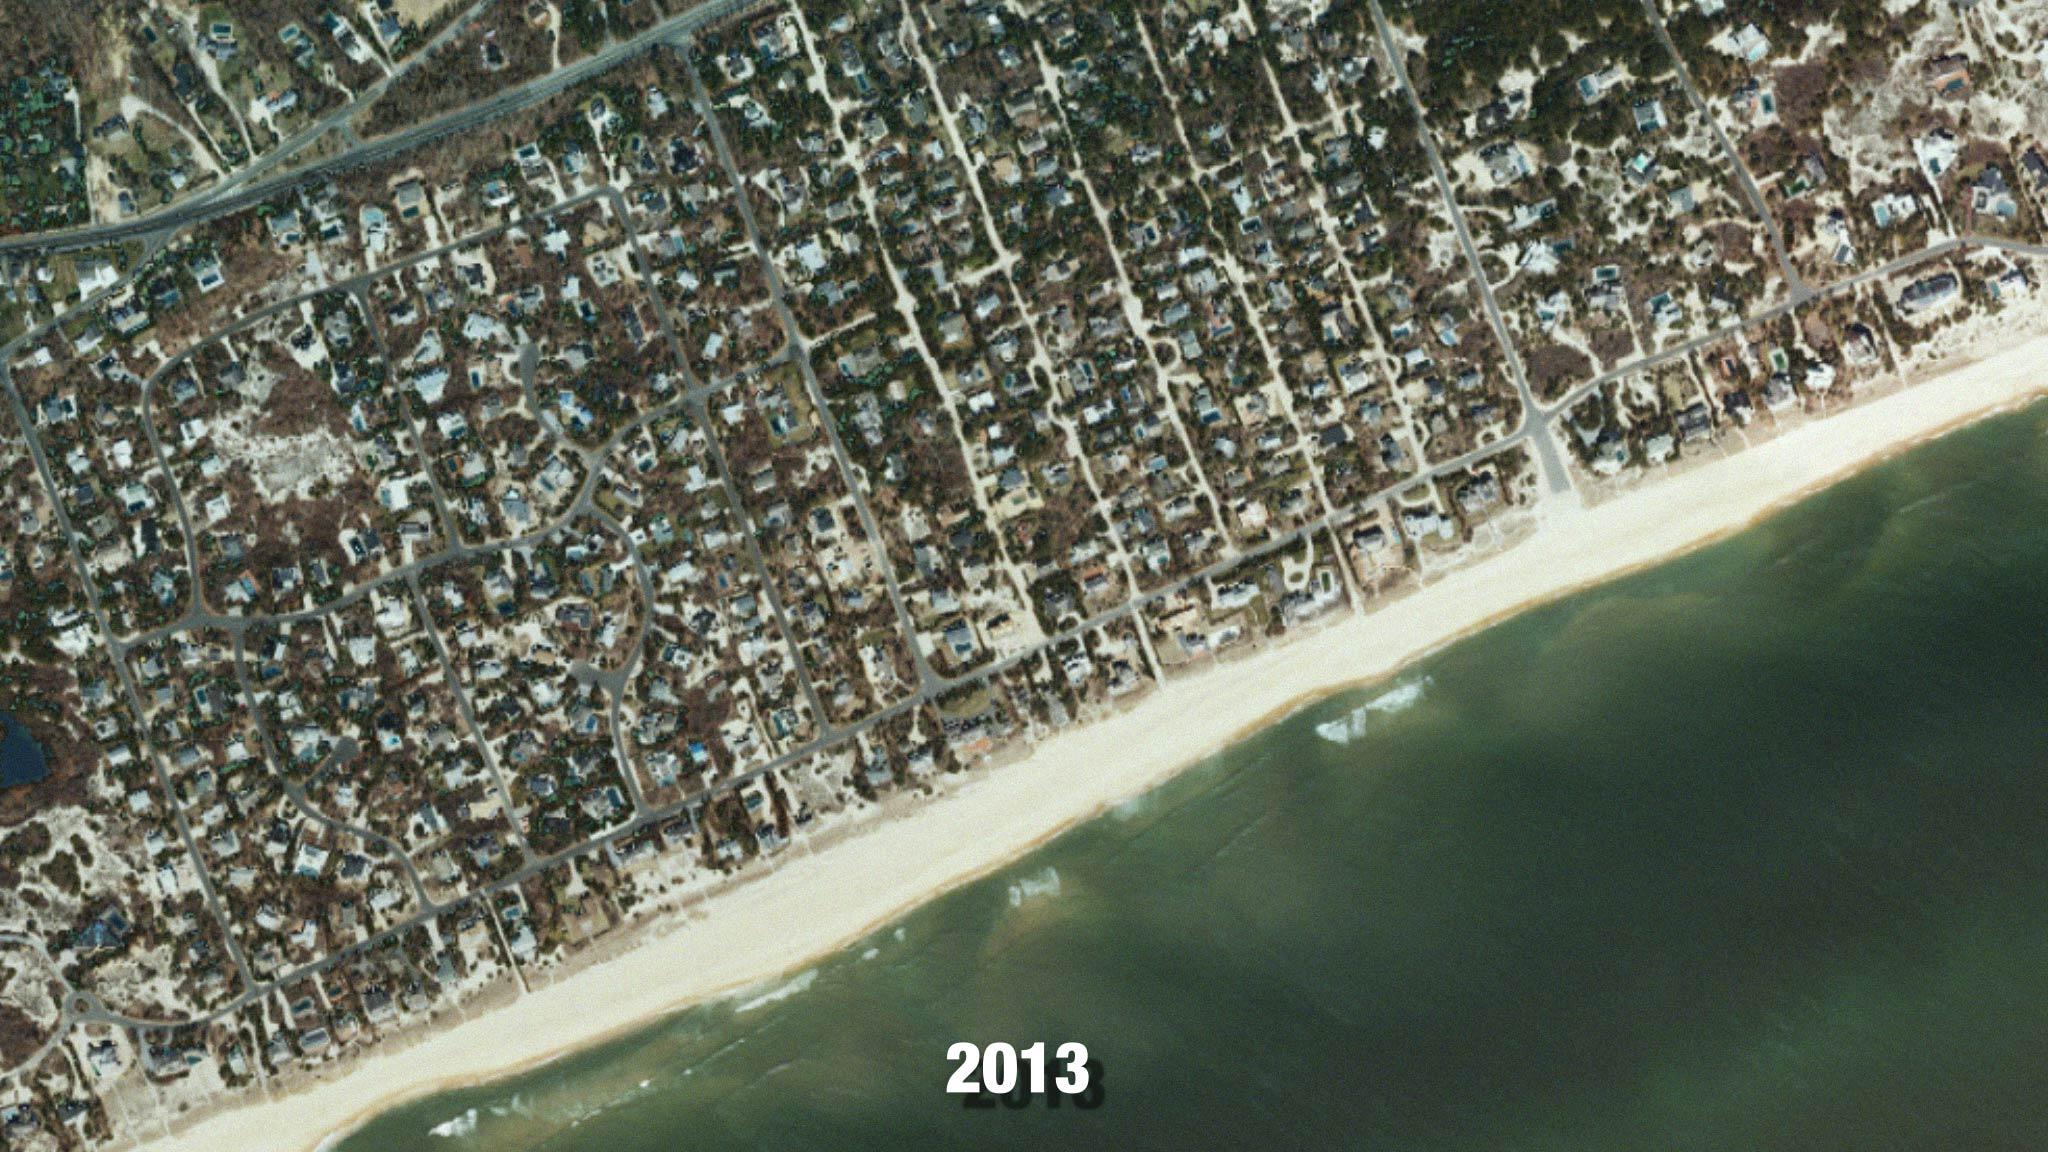 C_OBH_Hamptons_Satellite_2k_Static_01_After_Year.jpg